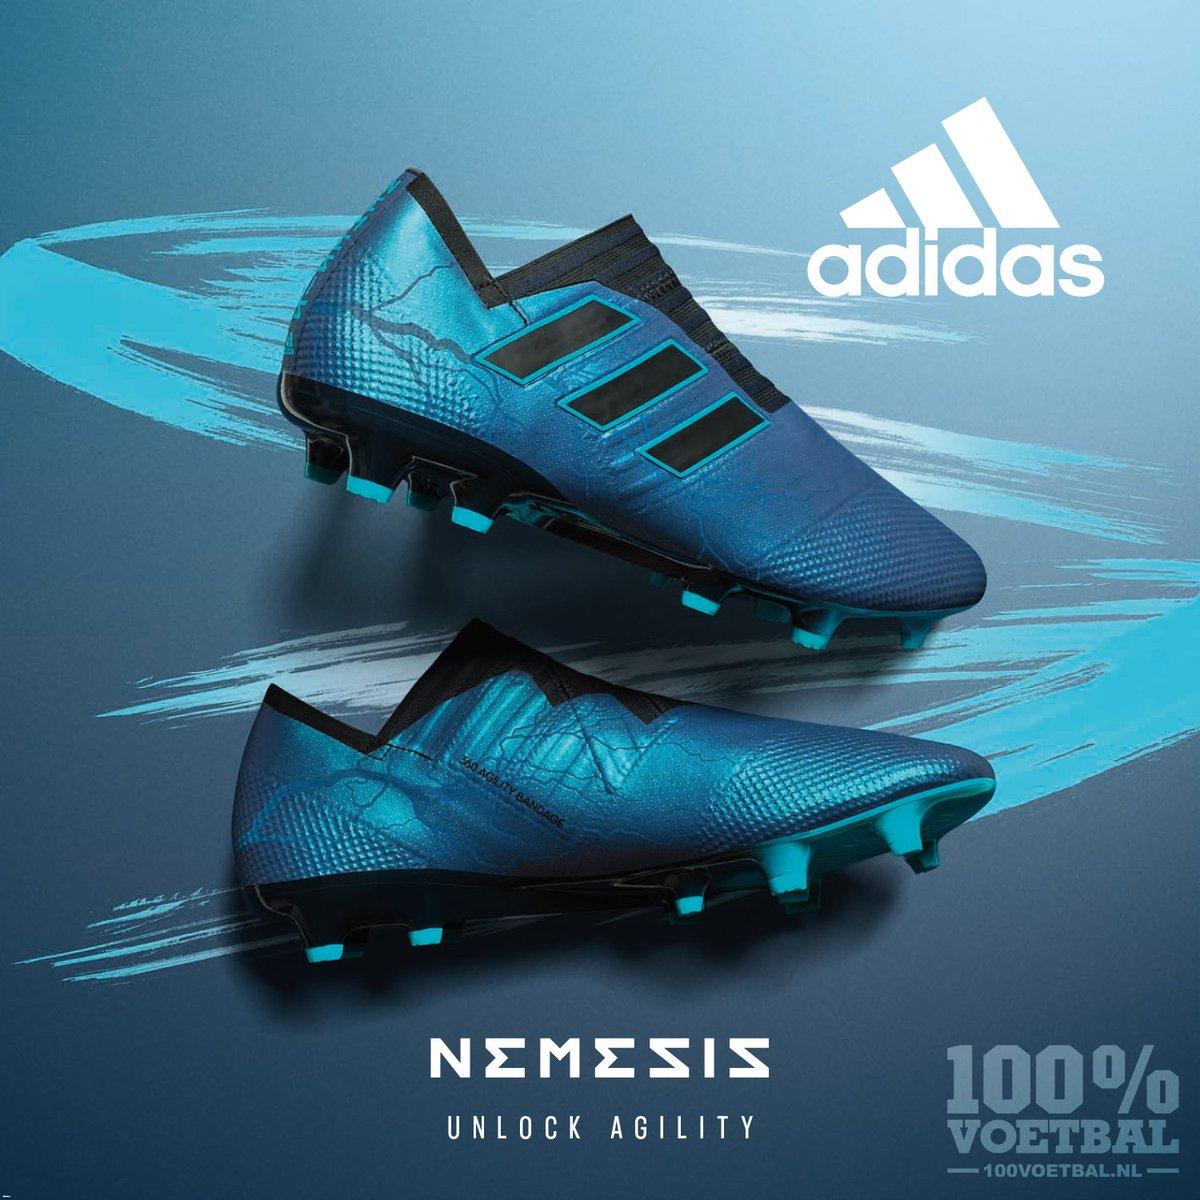 adidas voetbalschoenen 100 voetbal